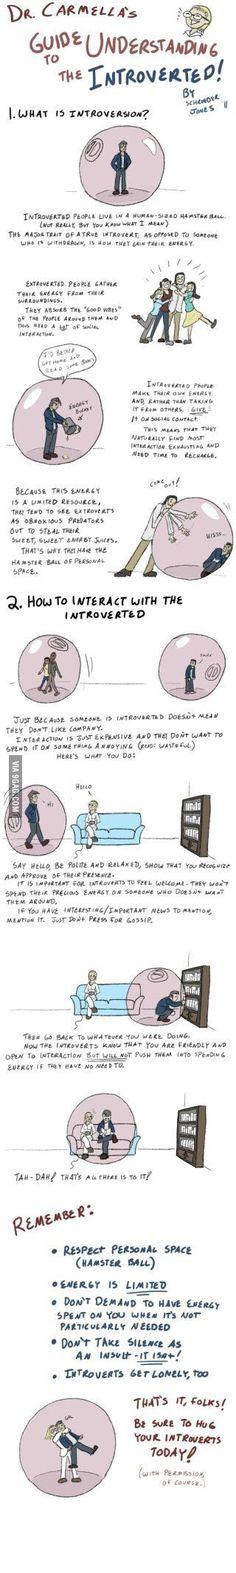 Hug your introvert!